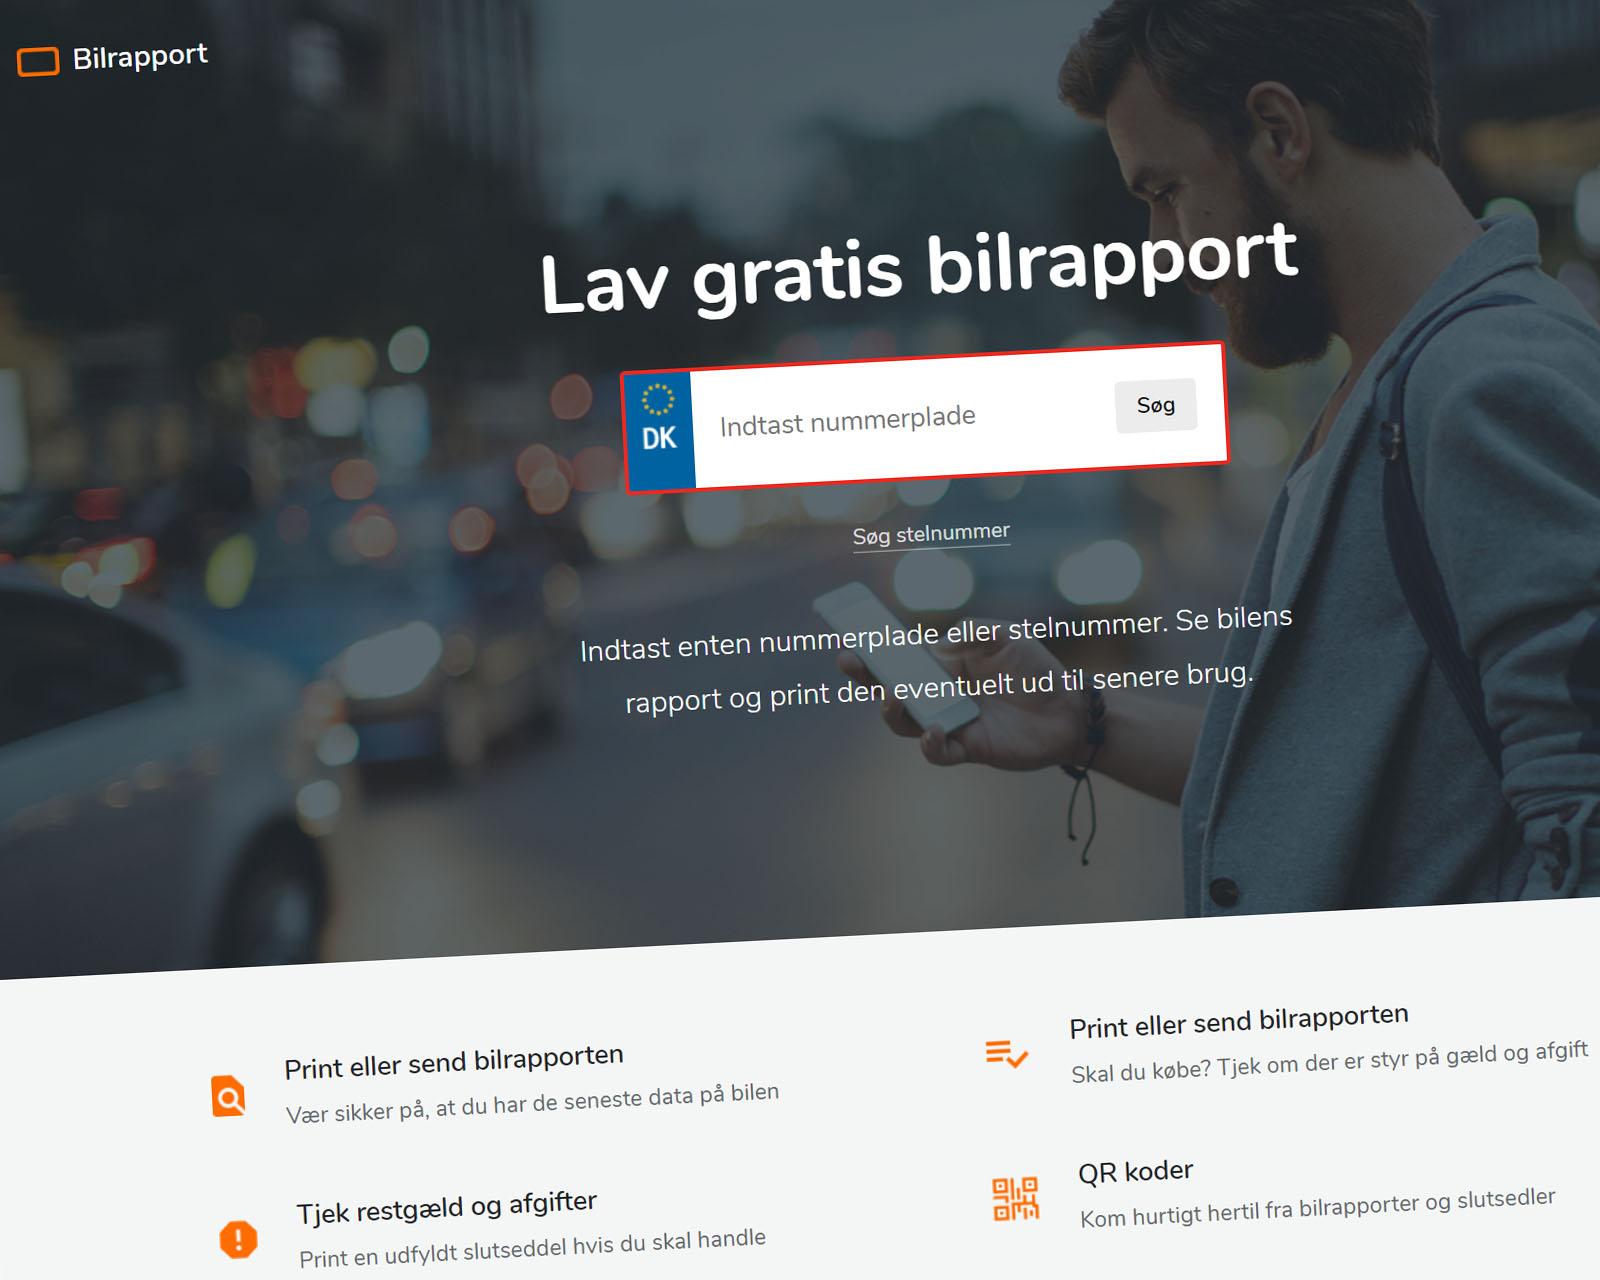 Bilrapport.dk